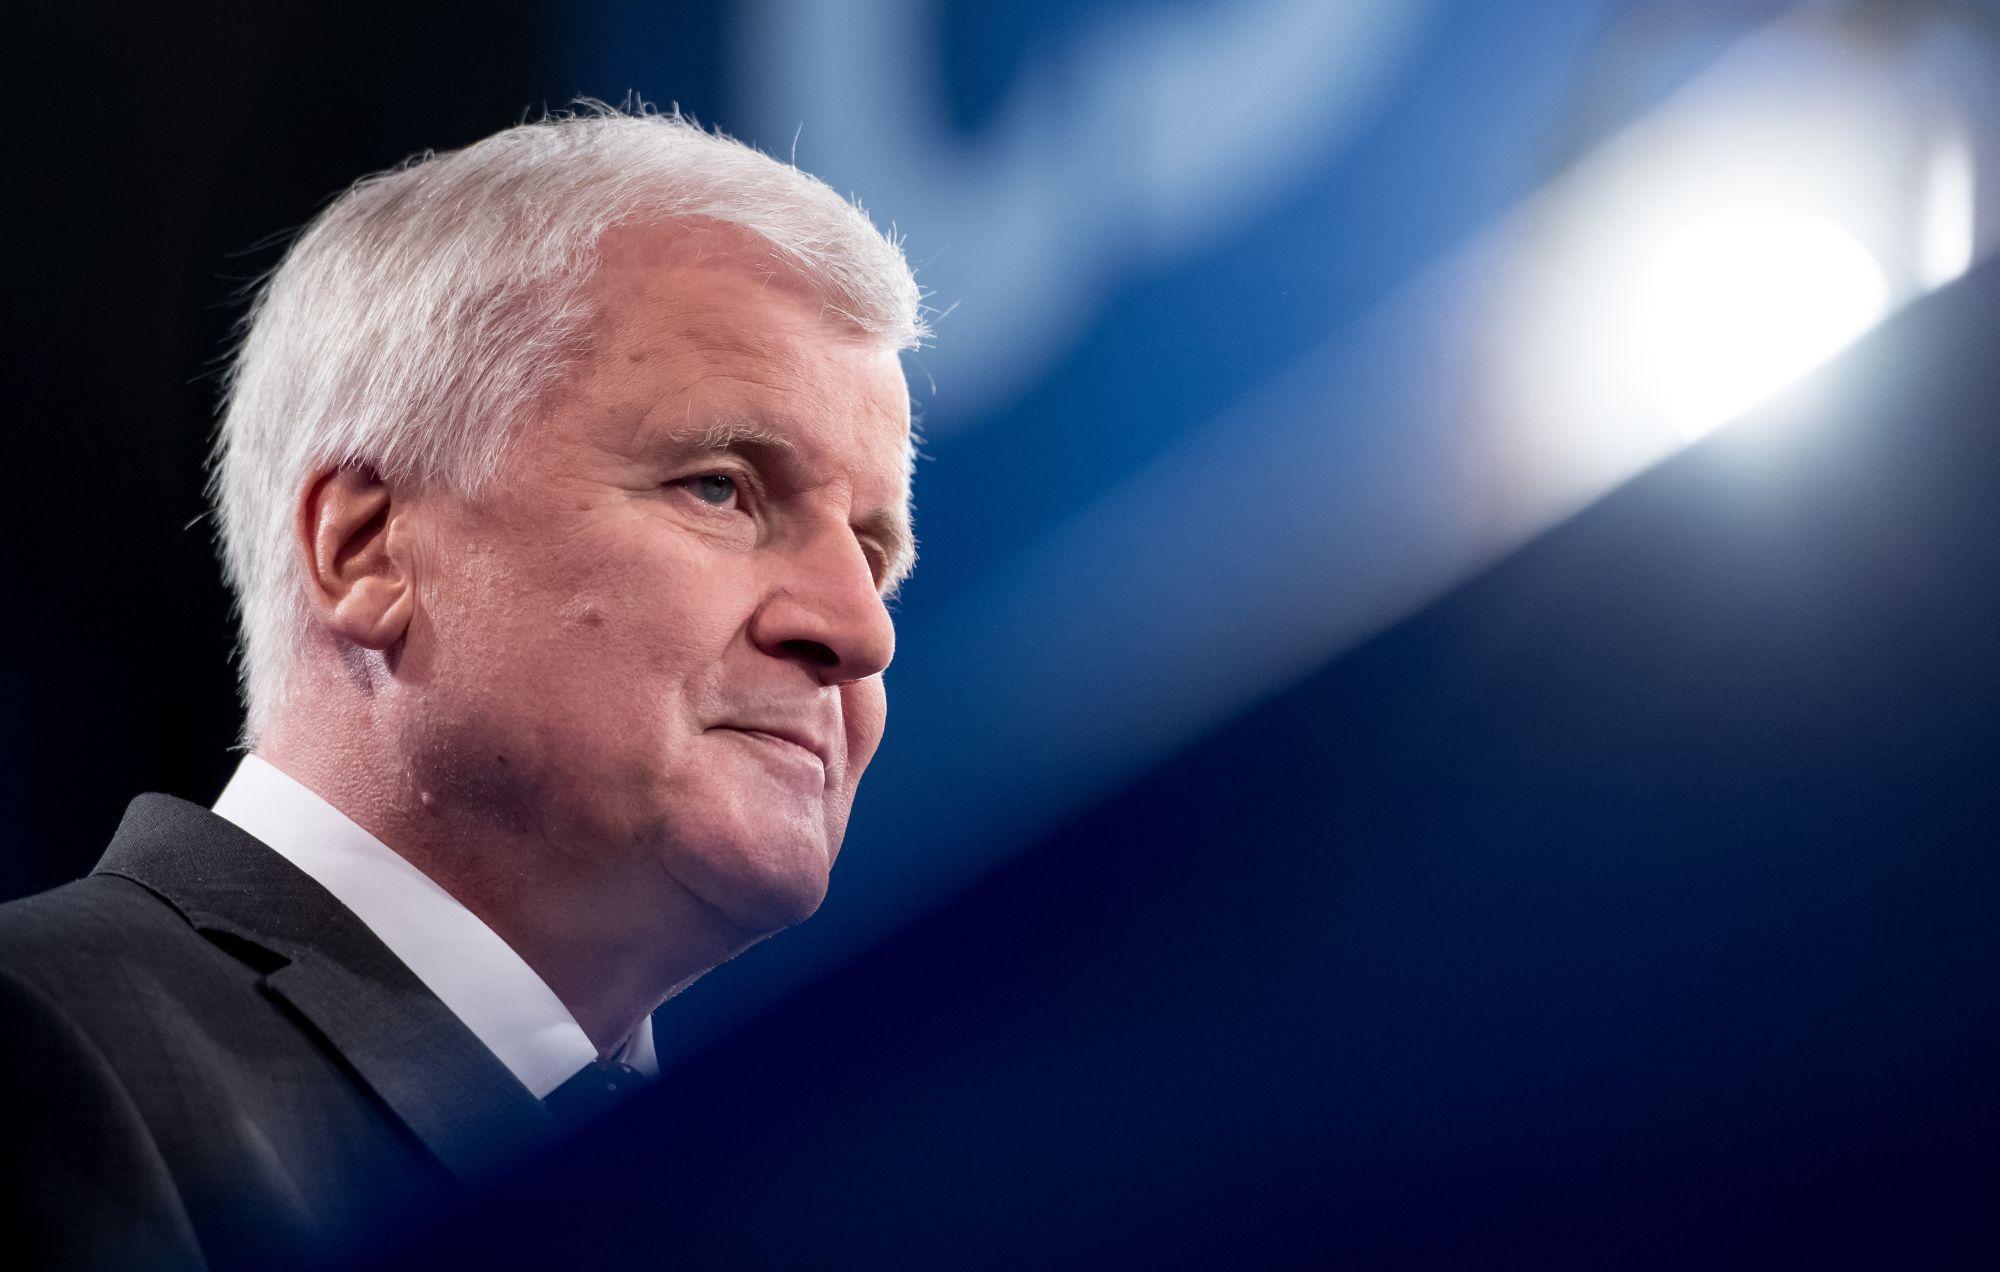 Bayerns Ministerpräsident Seehofer beerbt sich selbst